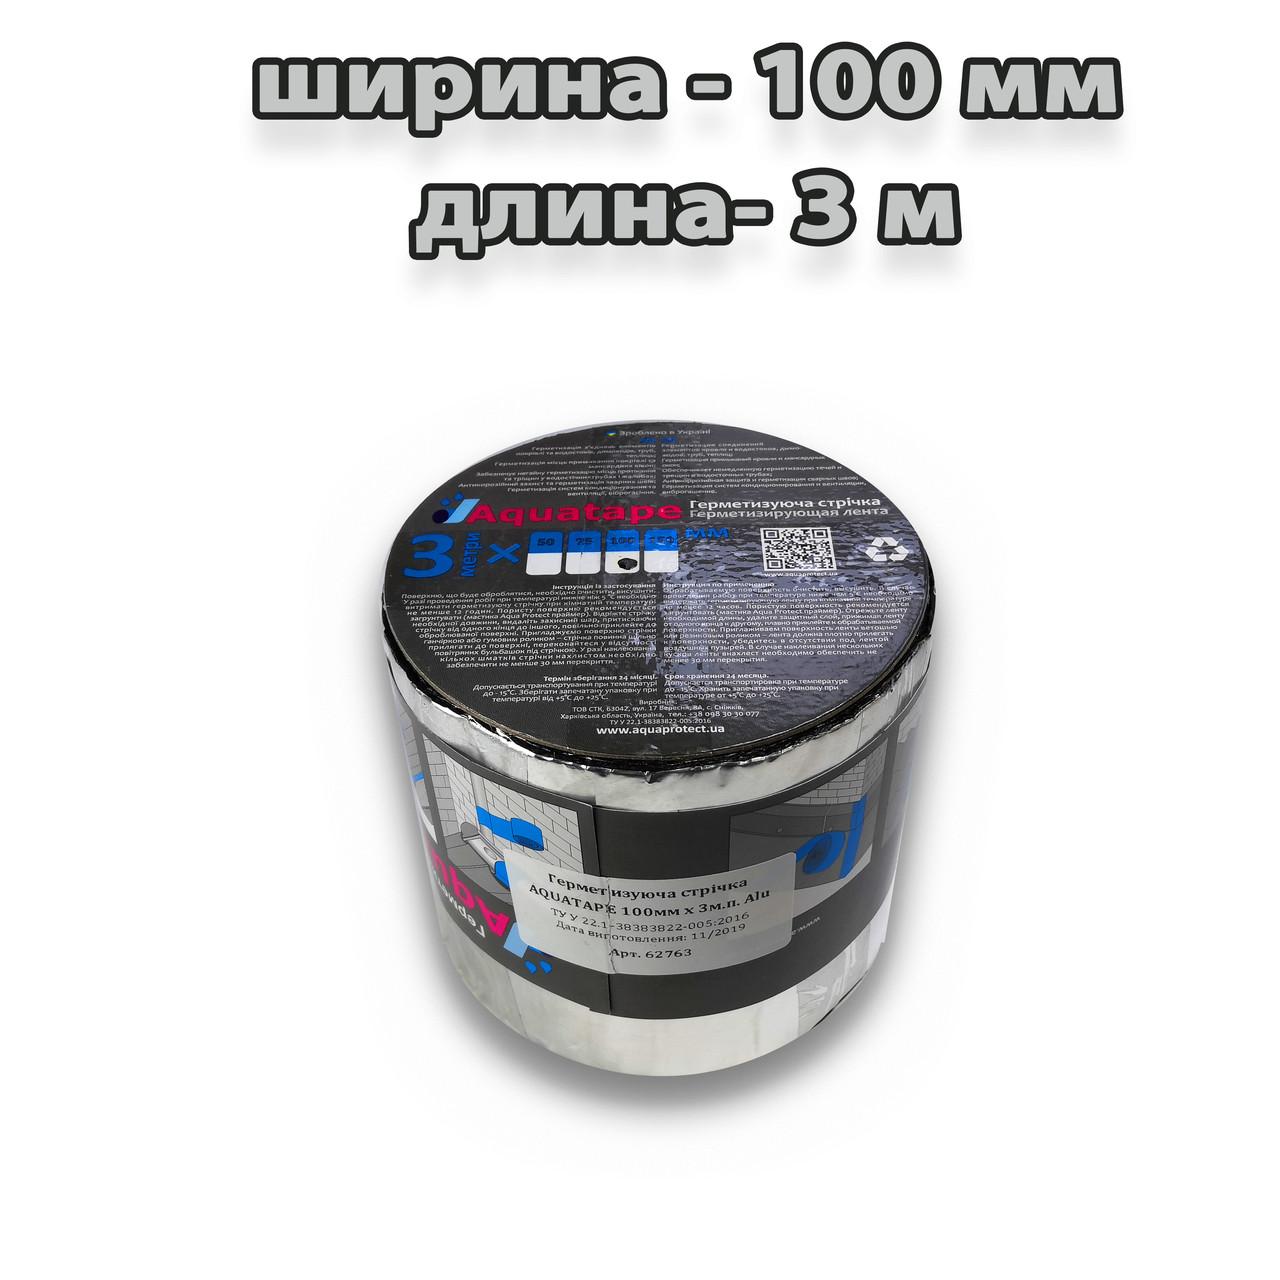 Битумная Лента 100 мм х 3 м ALU+